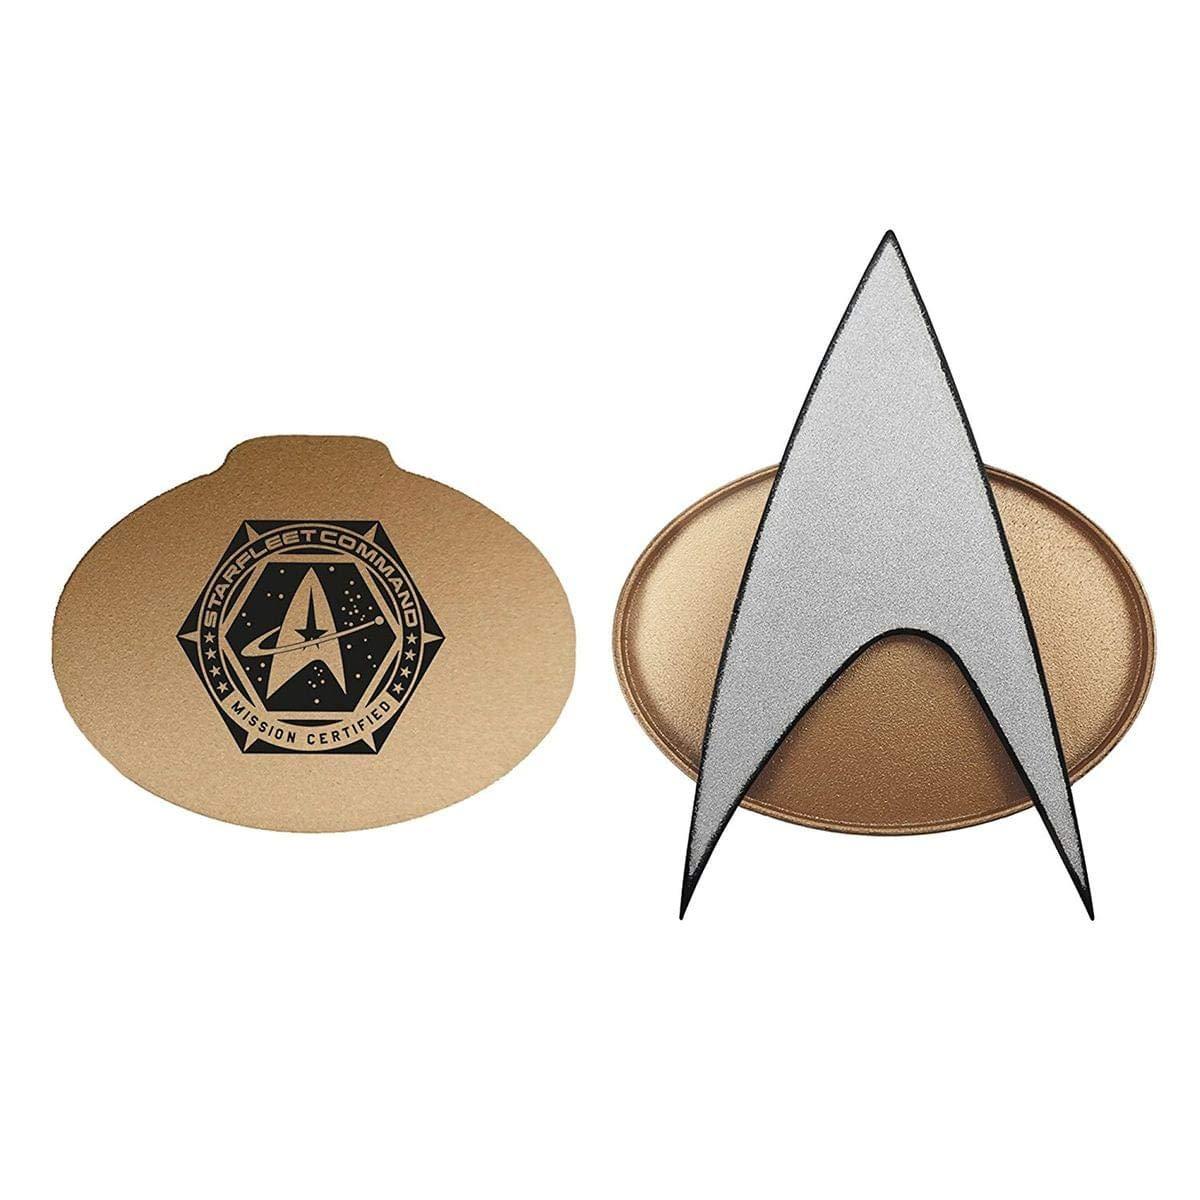 Star Trek: The Next Generation Blautooth Communicator Badge - Neue verbesserte Version